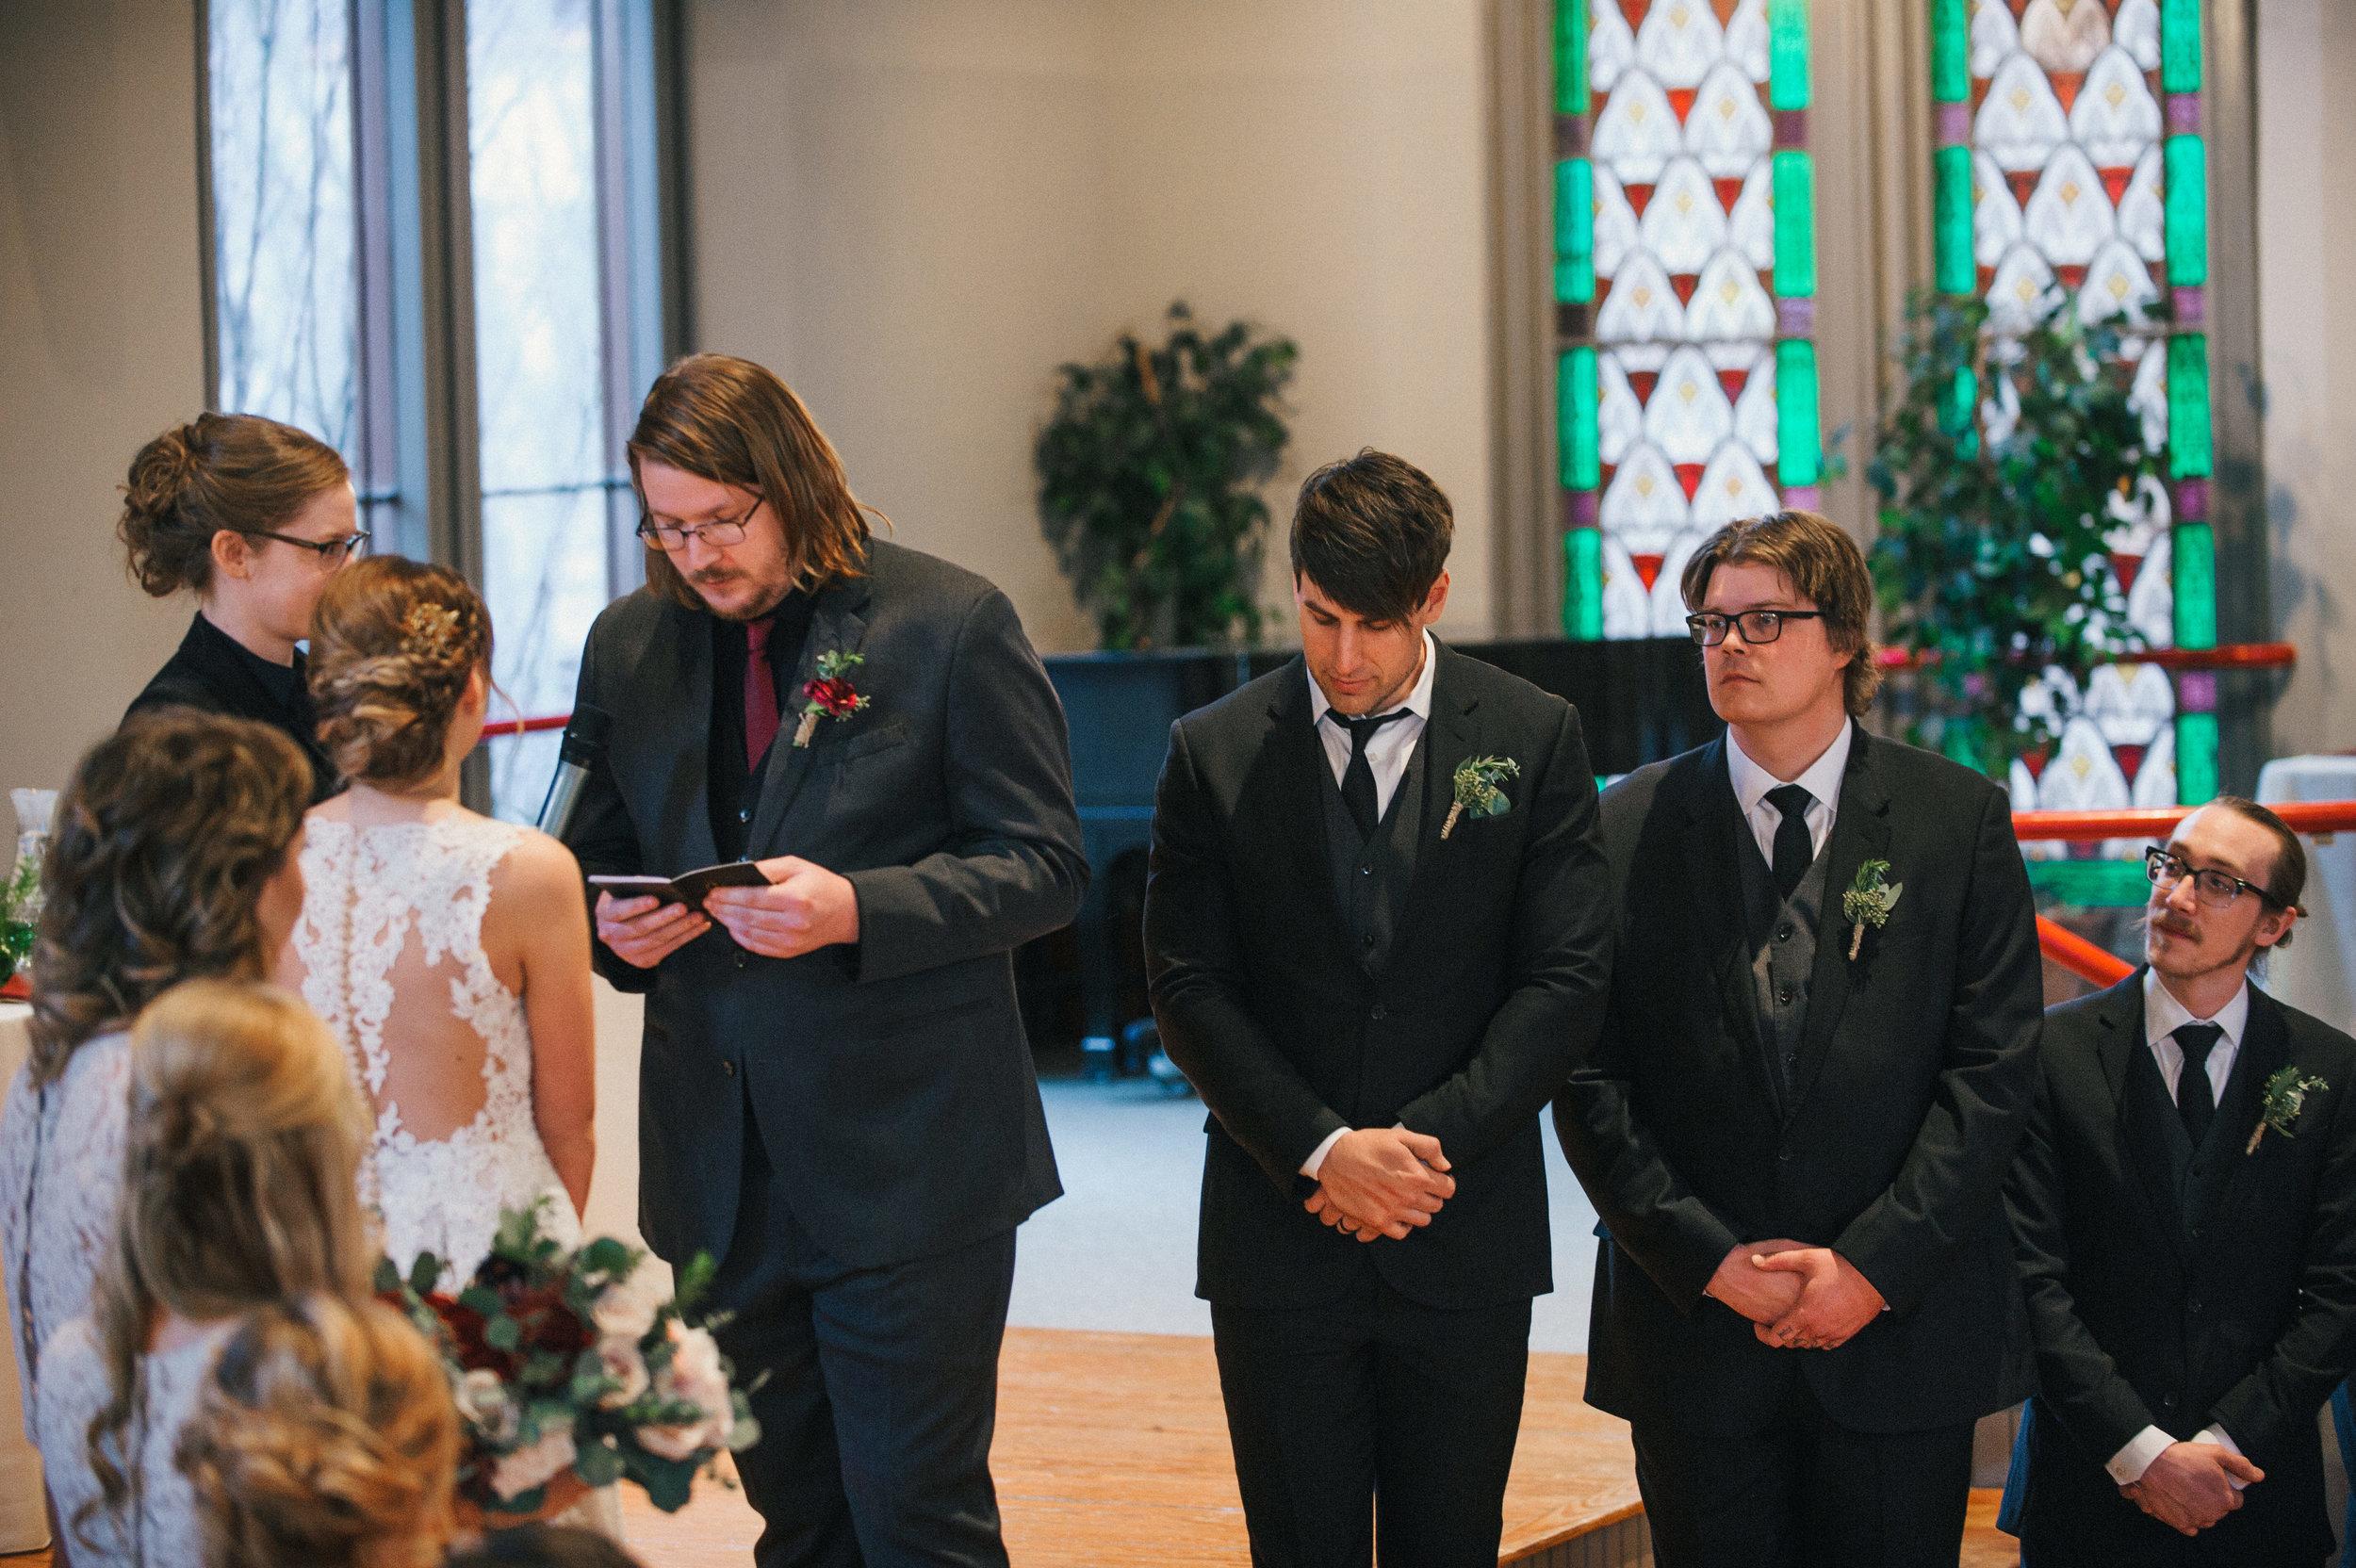 Amber and Kyles Wedding 41.jpg